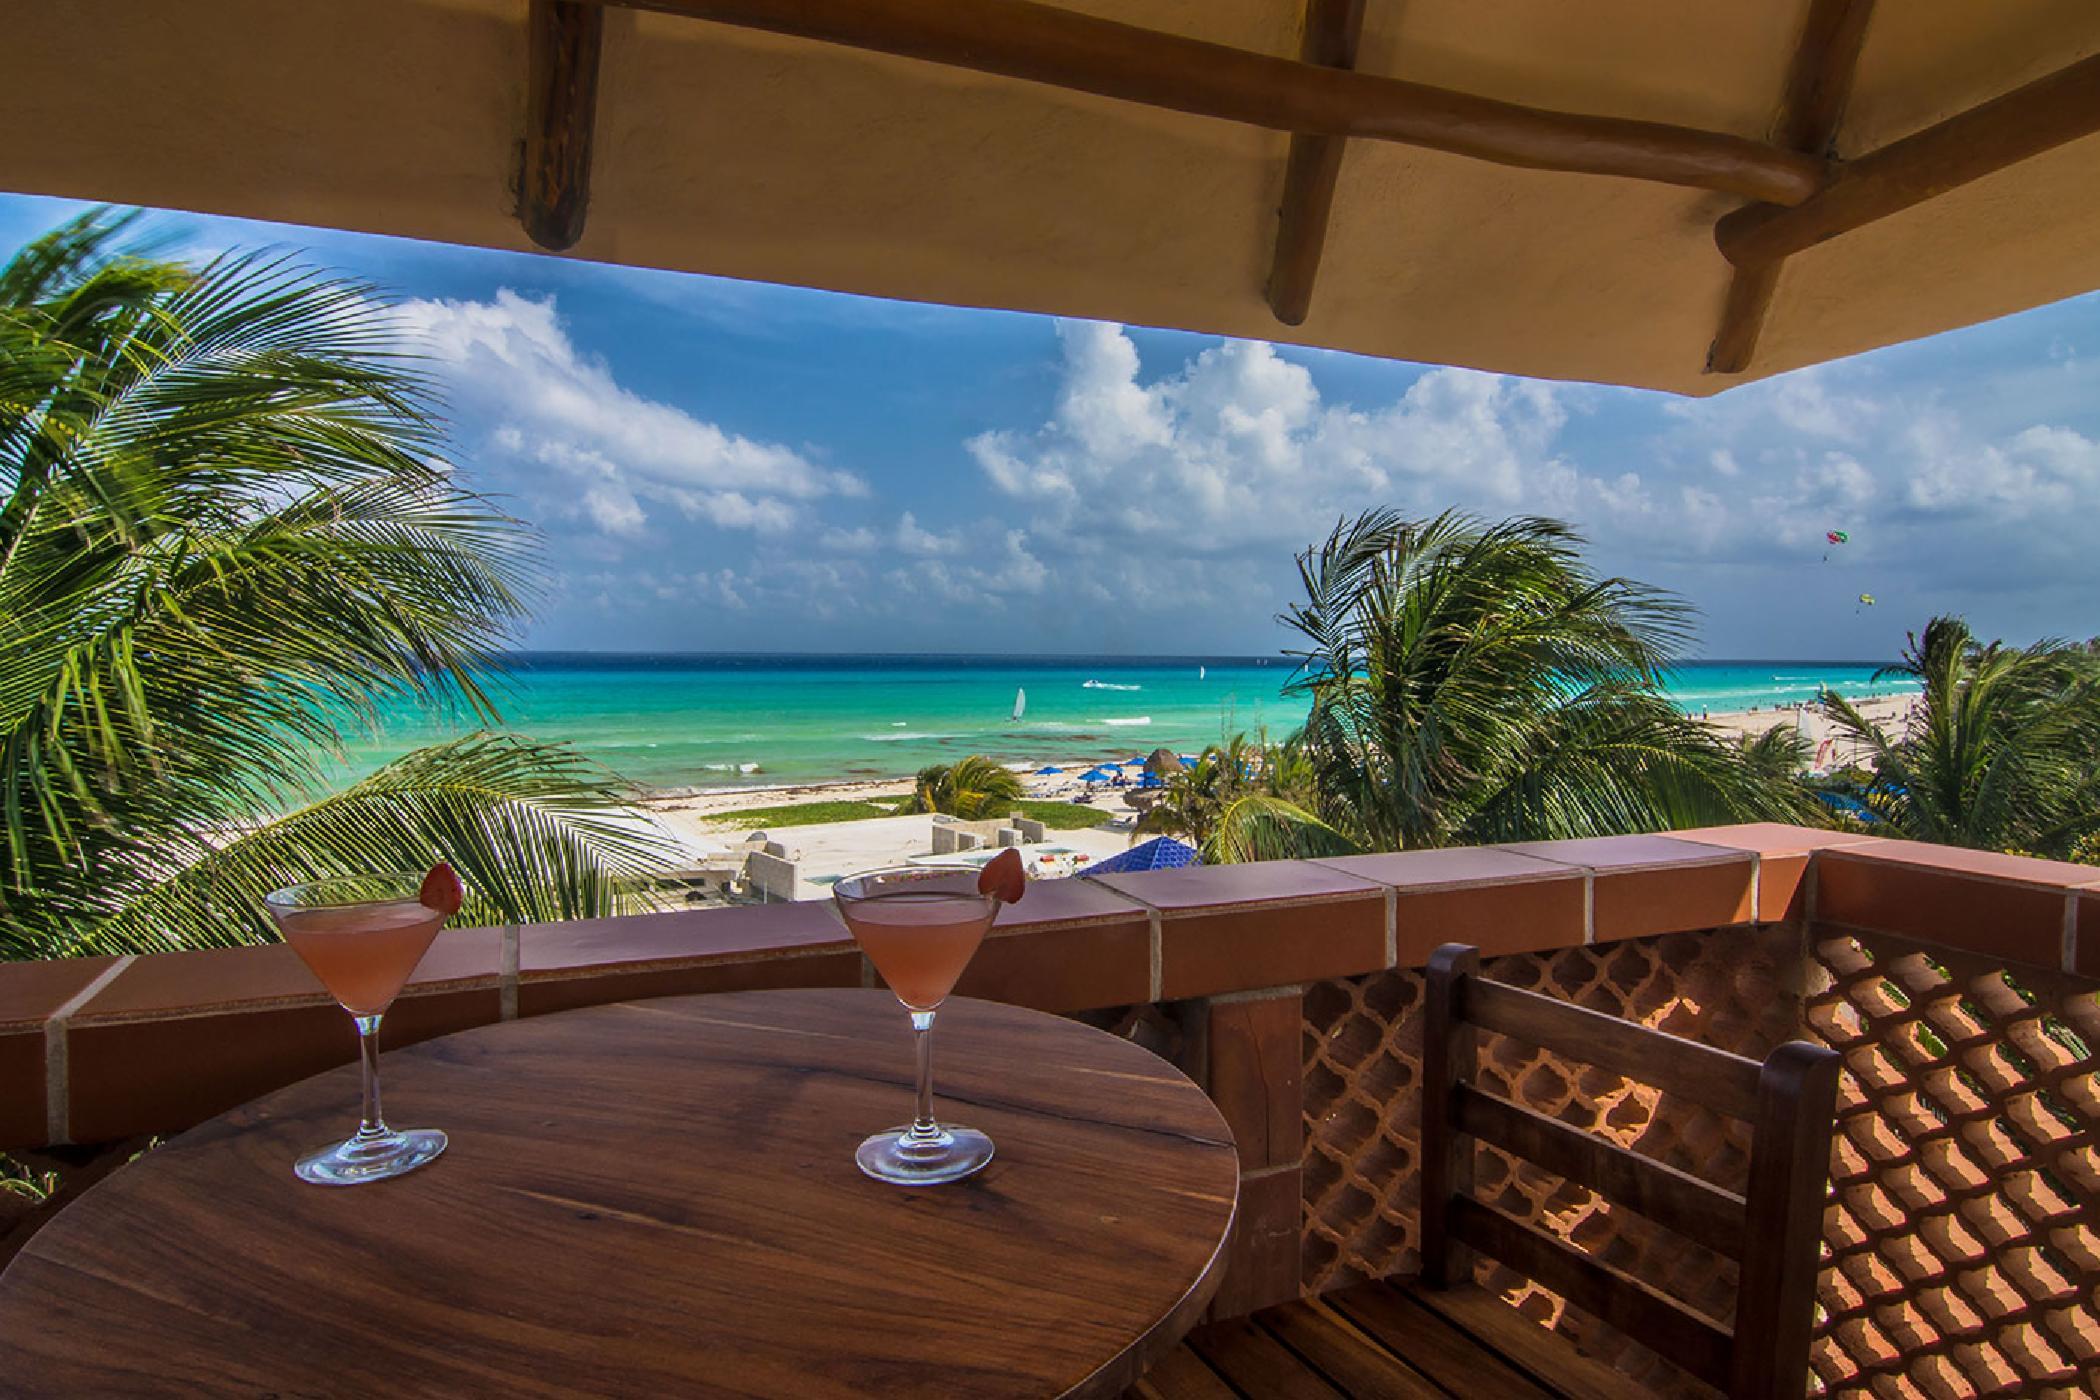 Playa del Carmen private 4 BDR castle home; Ocean Views, pool, tropical gardens, shuffleboard court